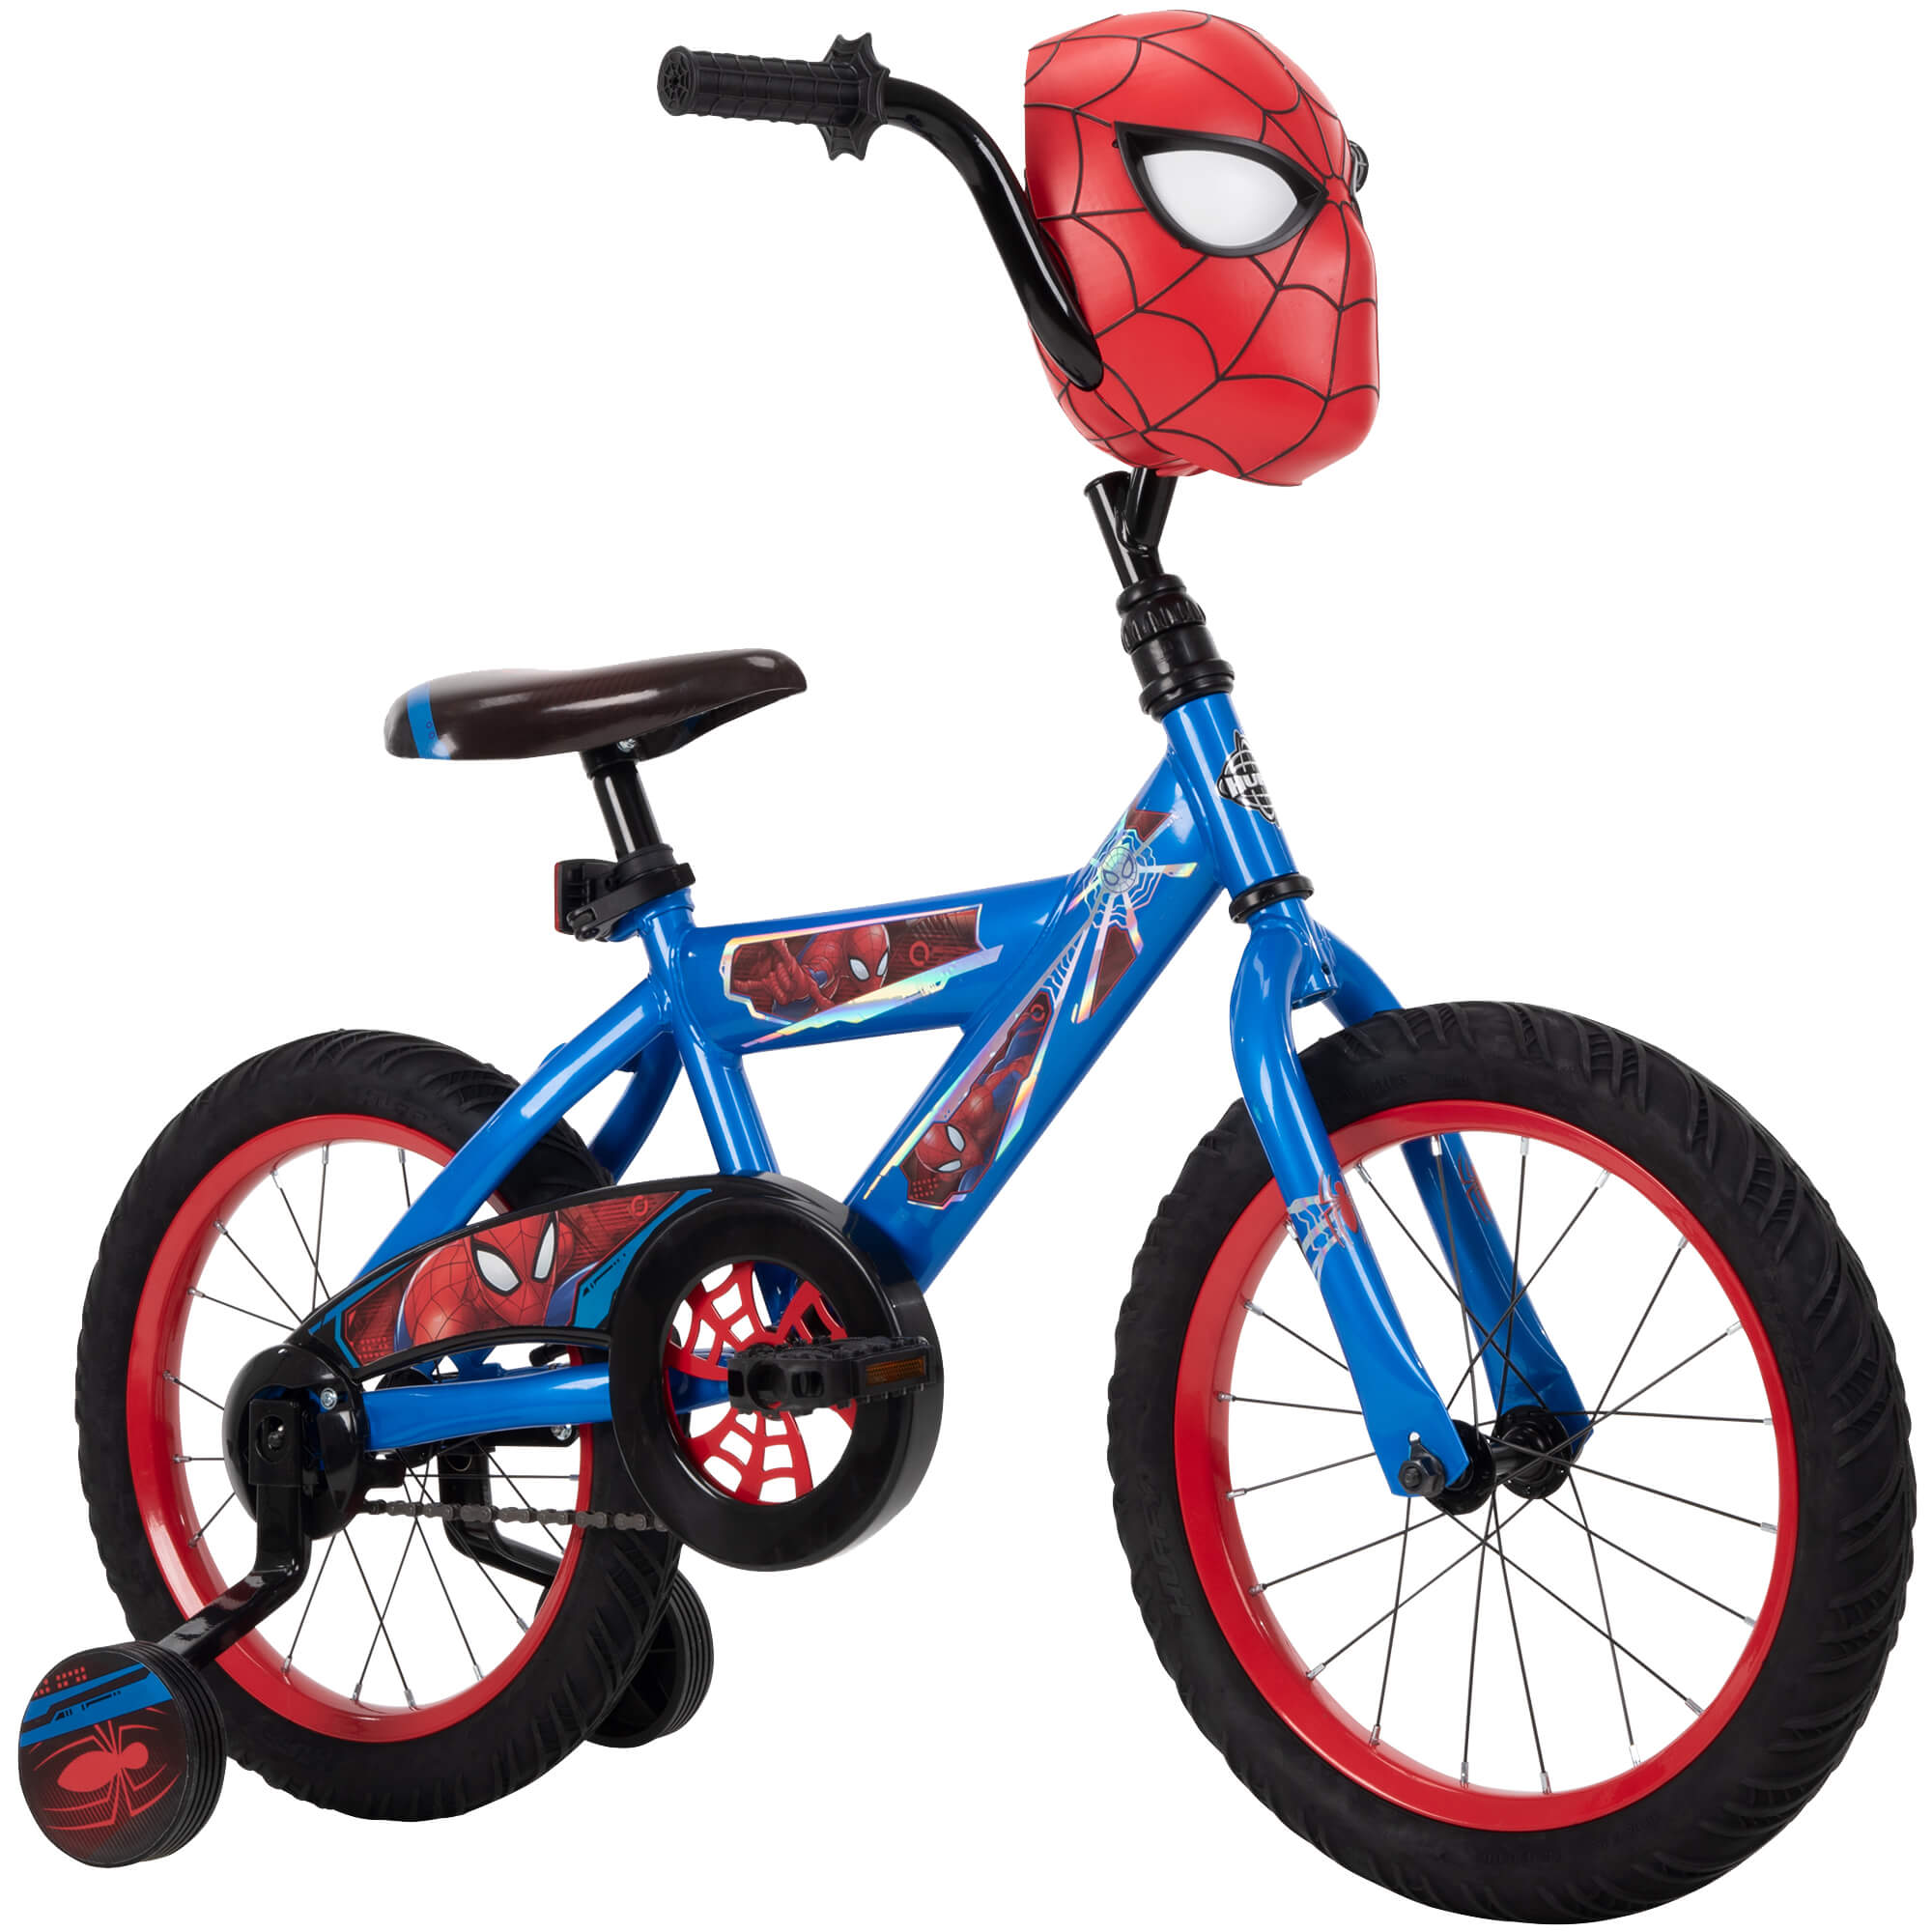 spiderman bikes at walmart in stock